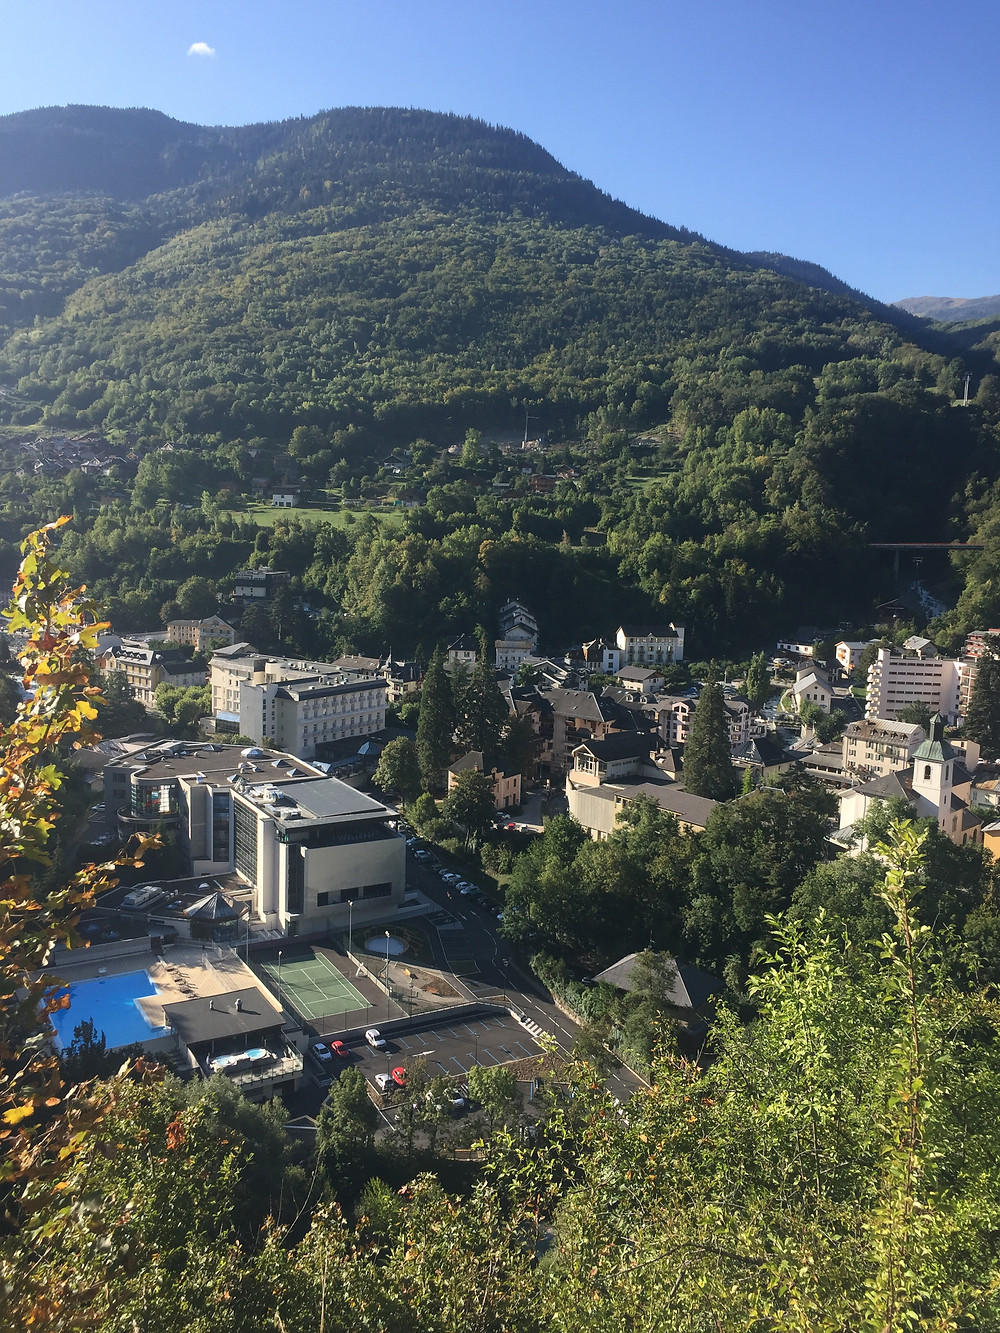 Brides-les-Bains September 2018